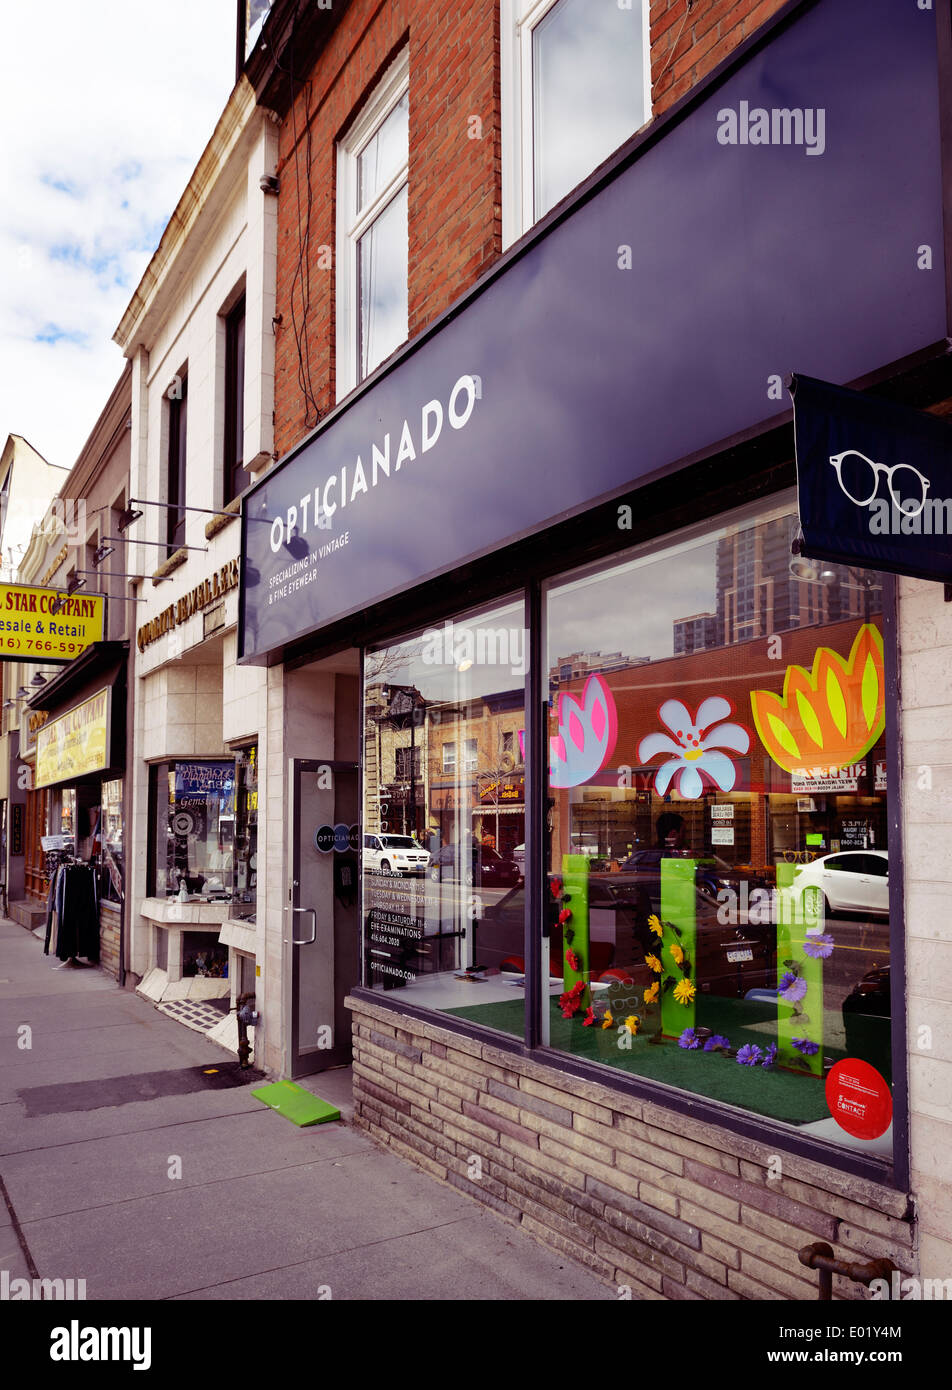 Opticianado vintage eyewear store at the Junction neighbourhood in Toronto, Canada - Stock Image